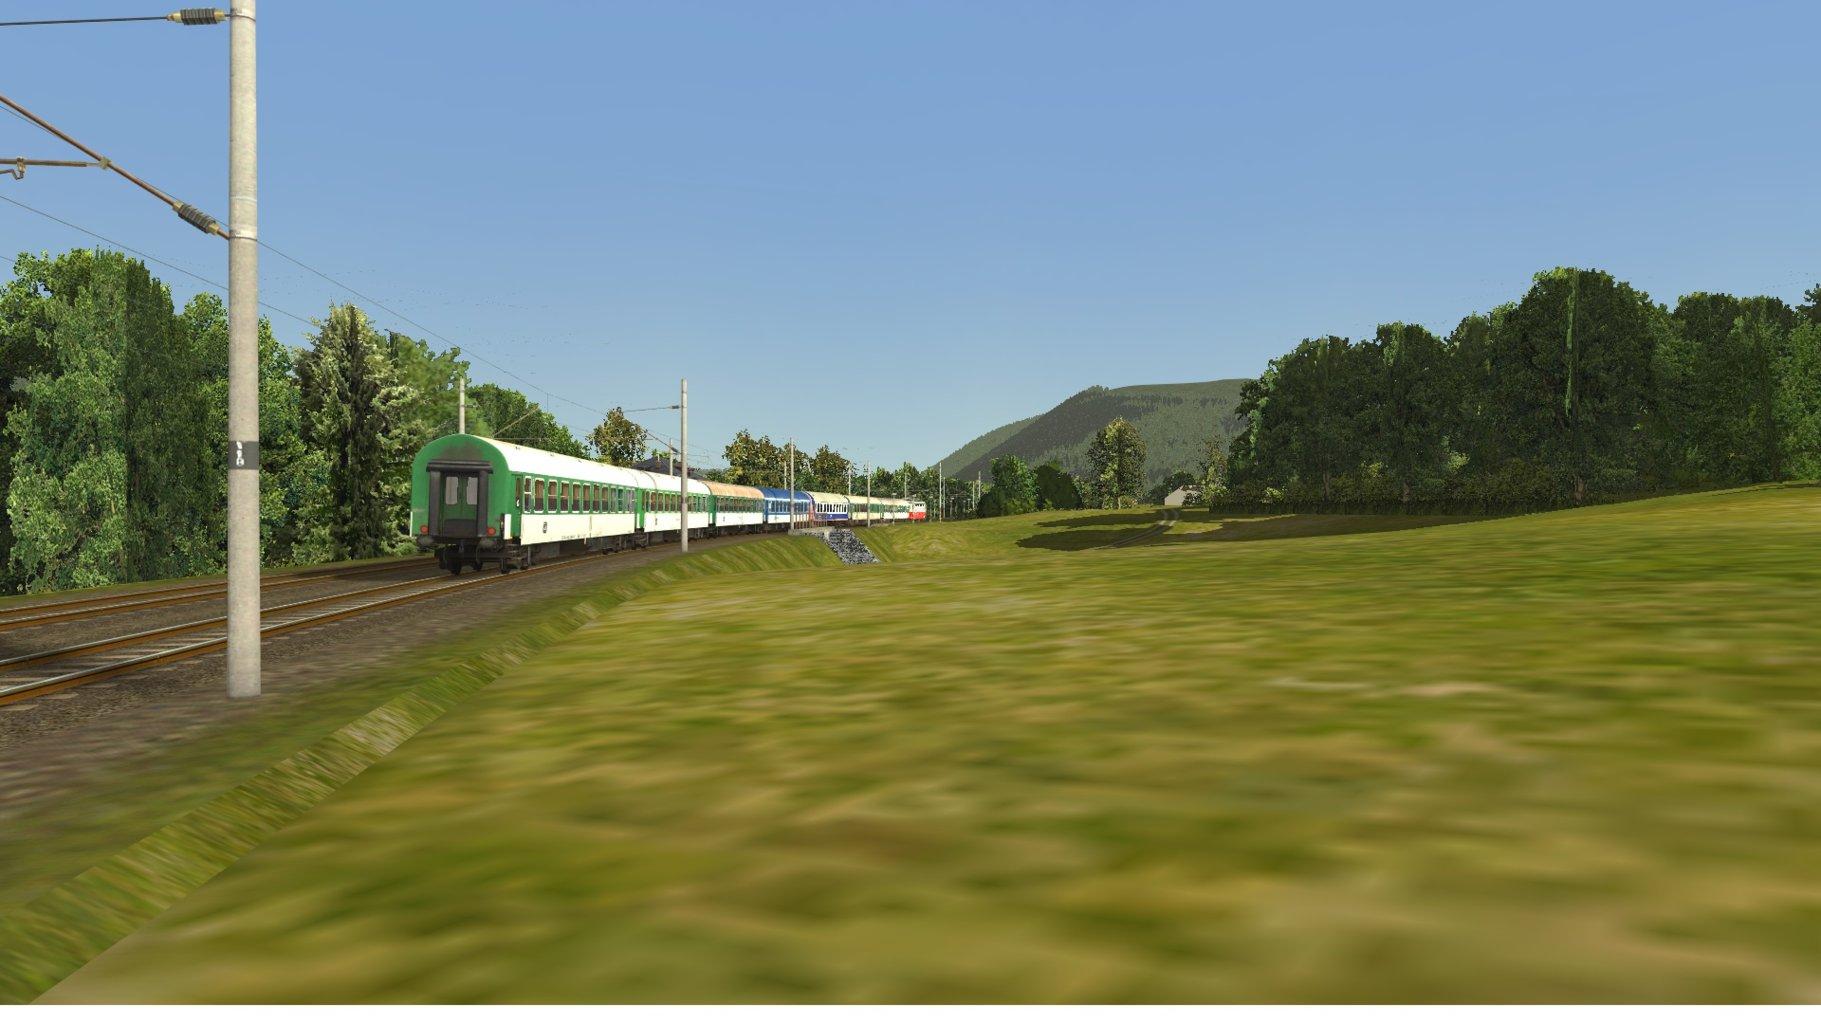 Open Rails 2021-04-29 08-31-48.jpg